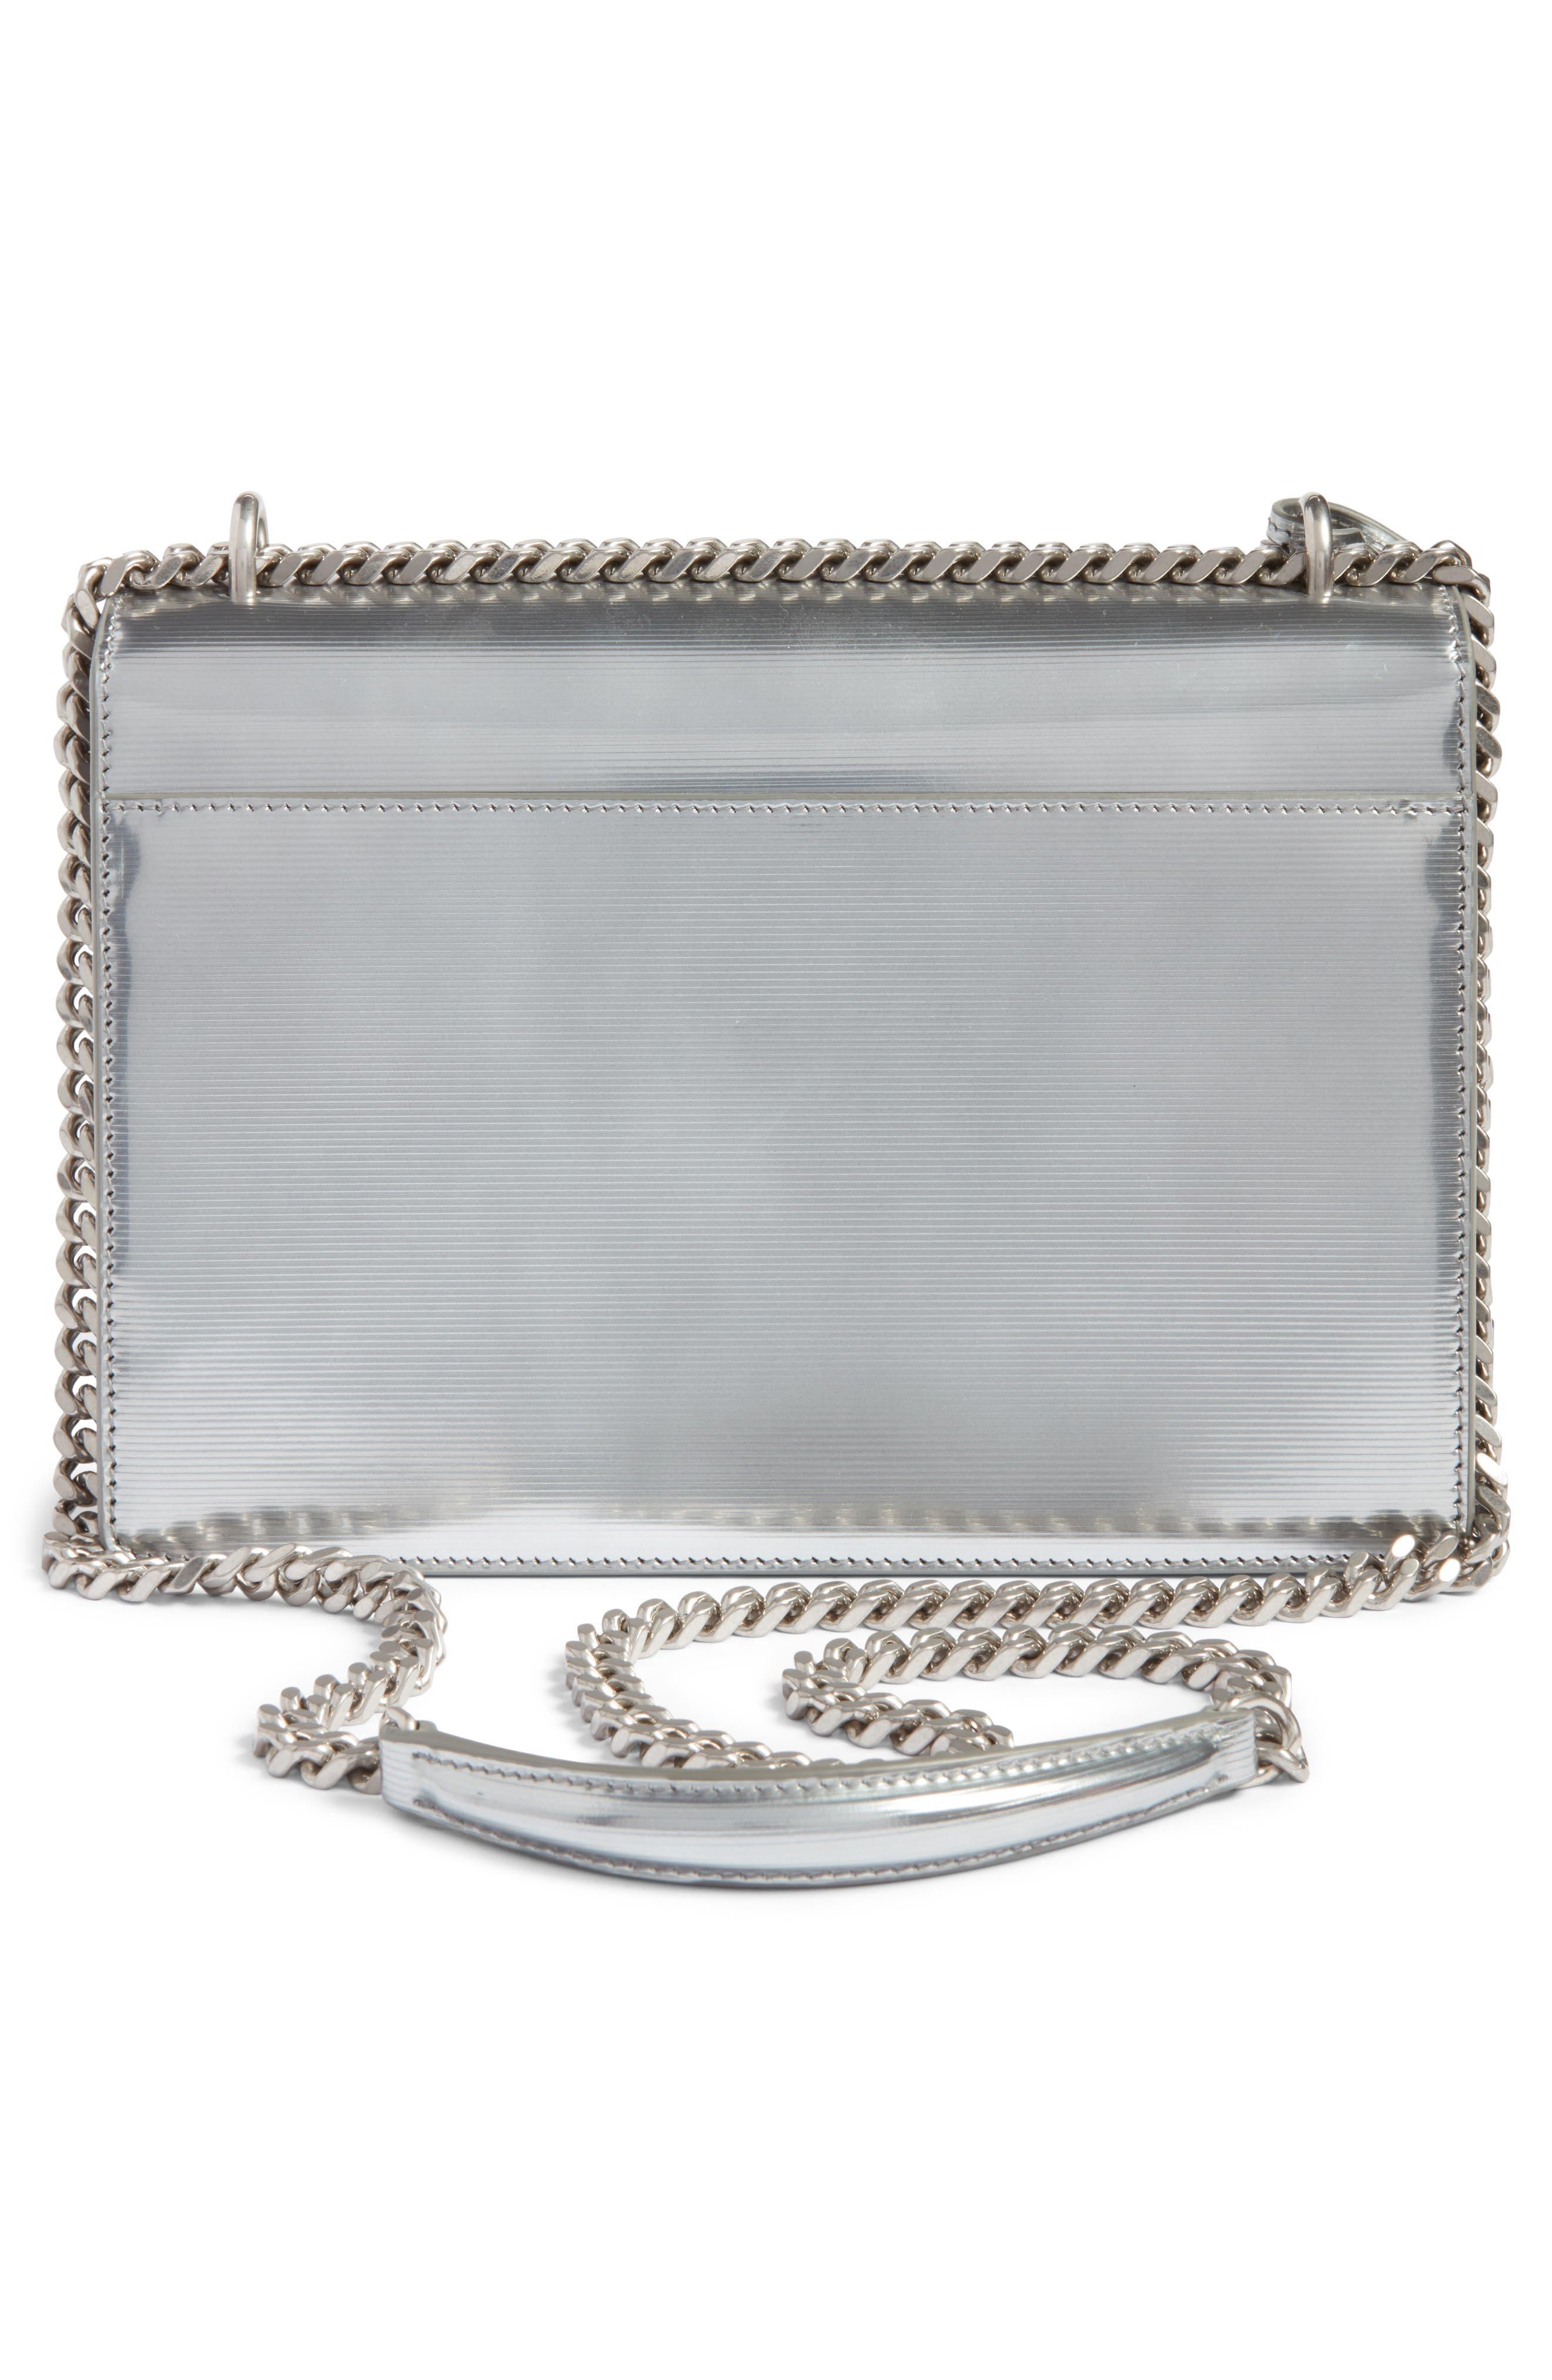 Medium Sunset Opium Leather Crossbody Bag,                             Alternate thumbnail 3, color,                             Dark Silver